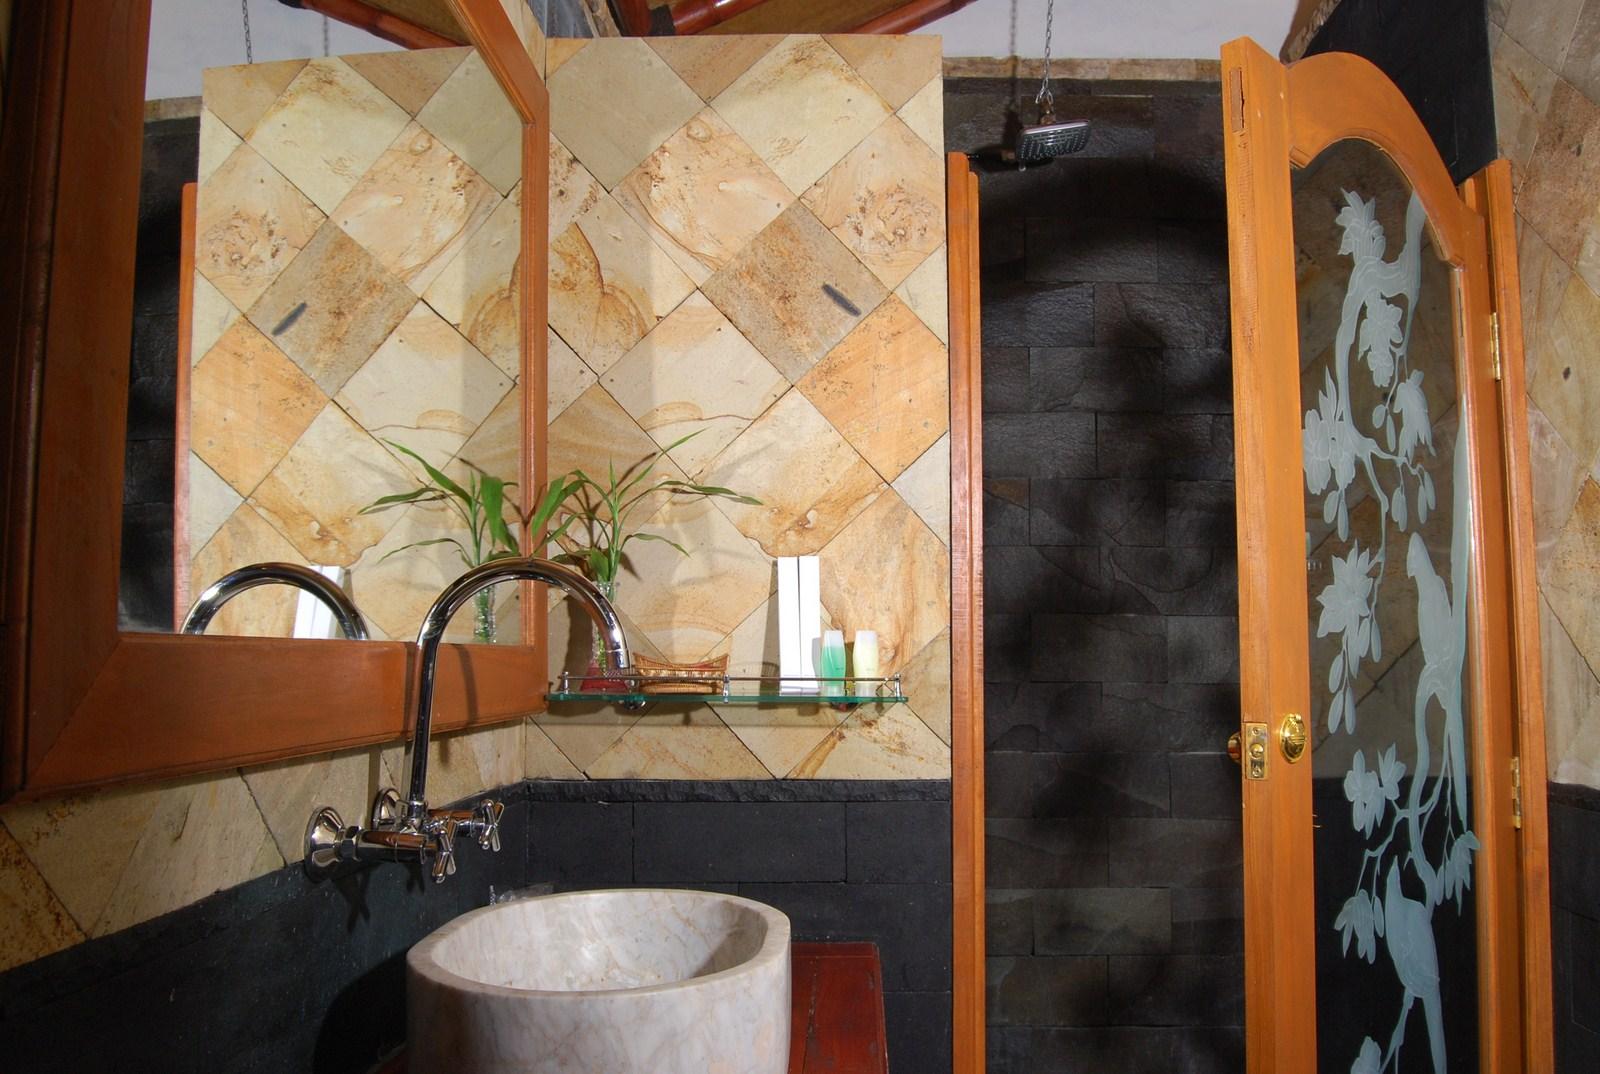 La salle de bain in english salle de bains for Salle de bain in english